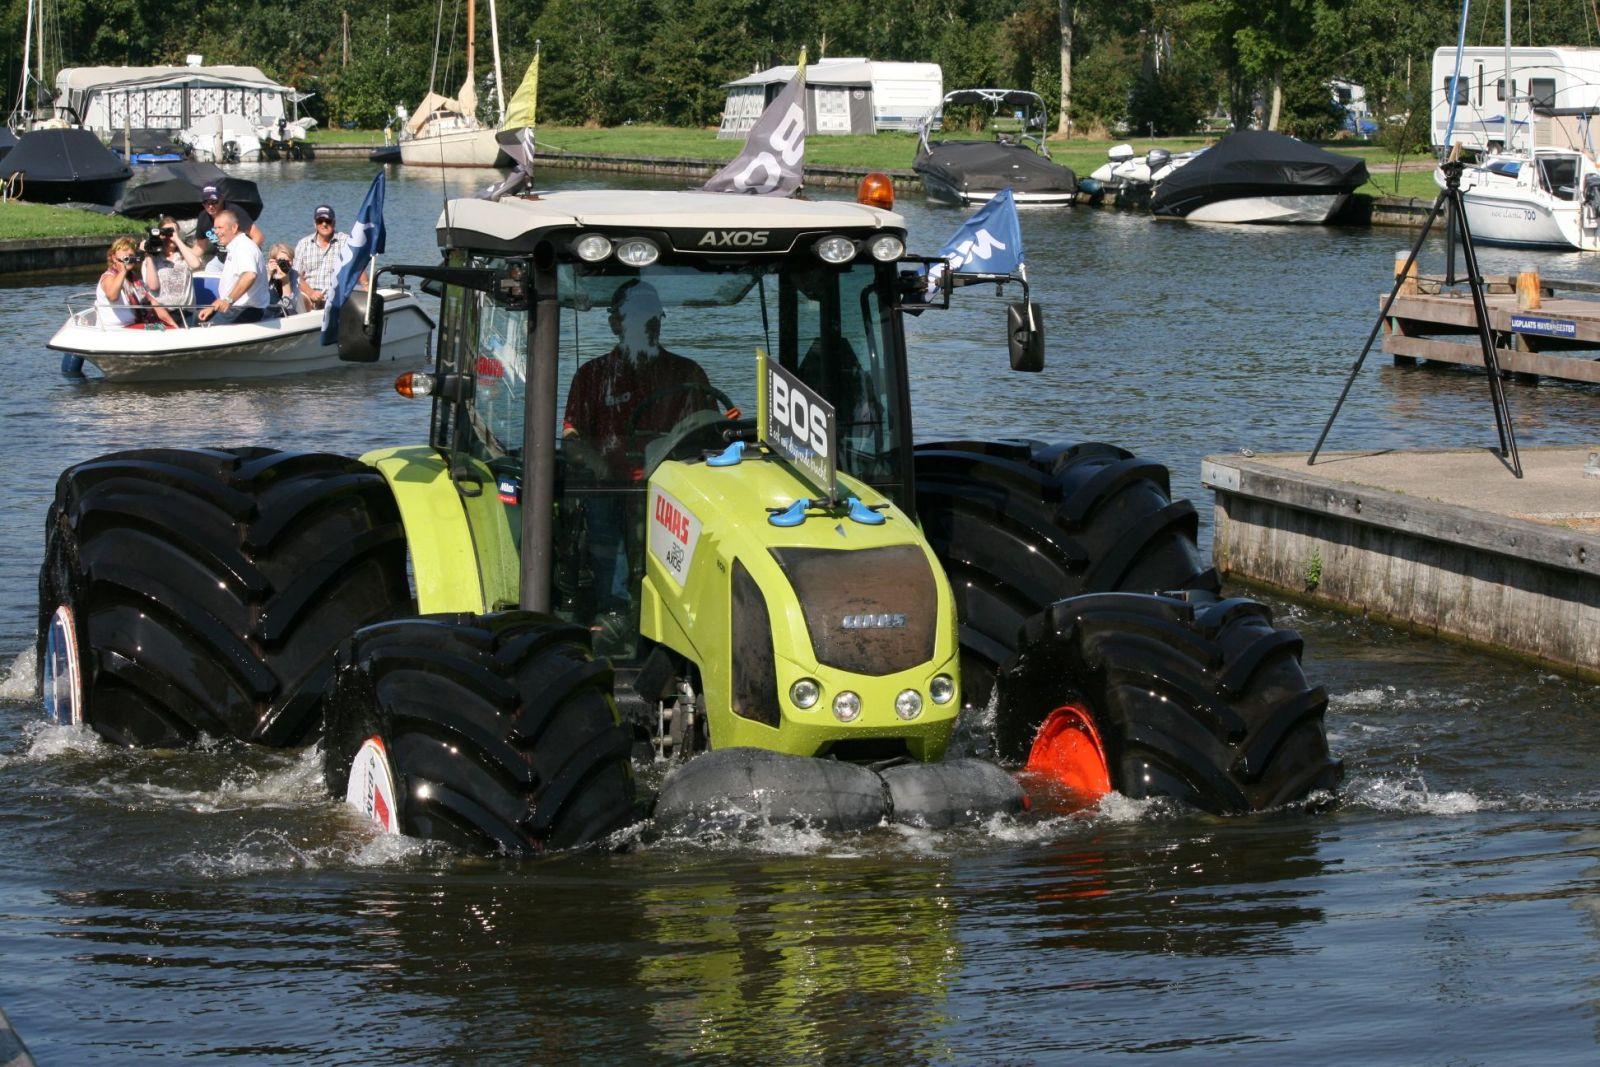 Mitas Tires Help Tractor Walk on Water